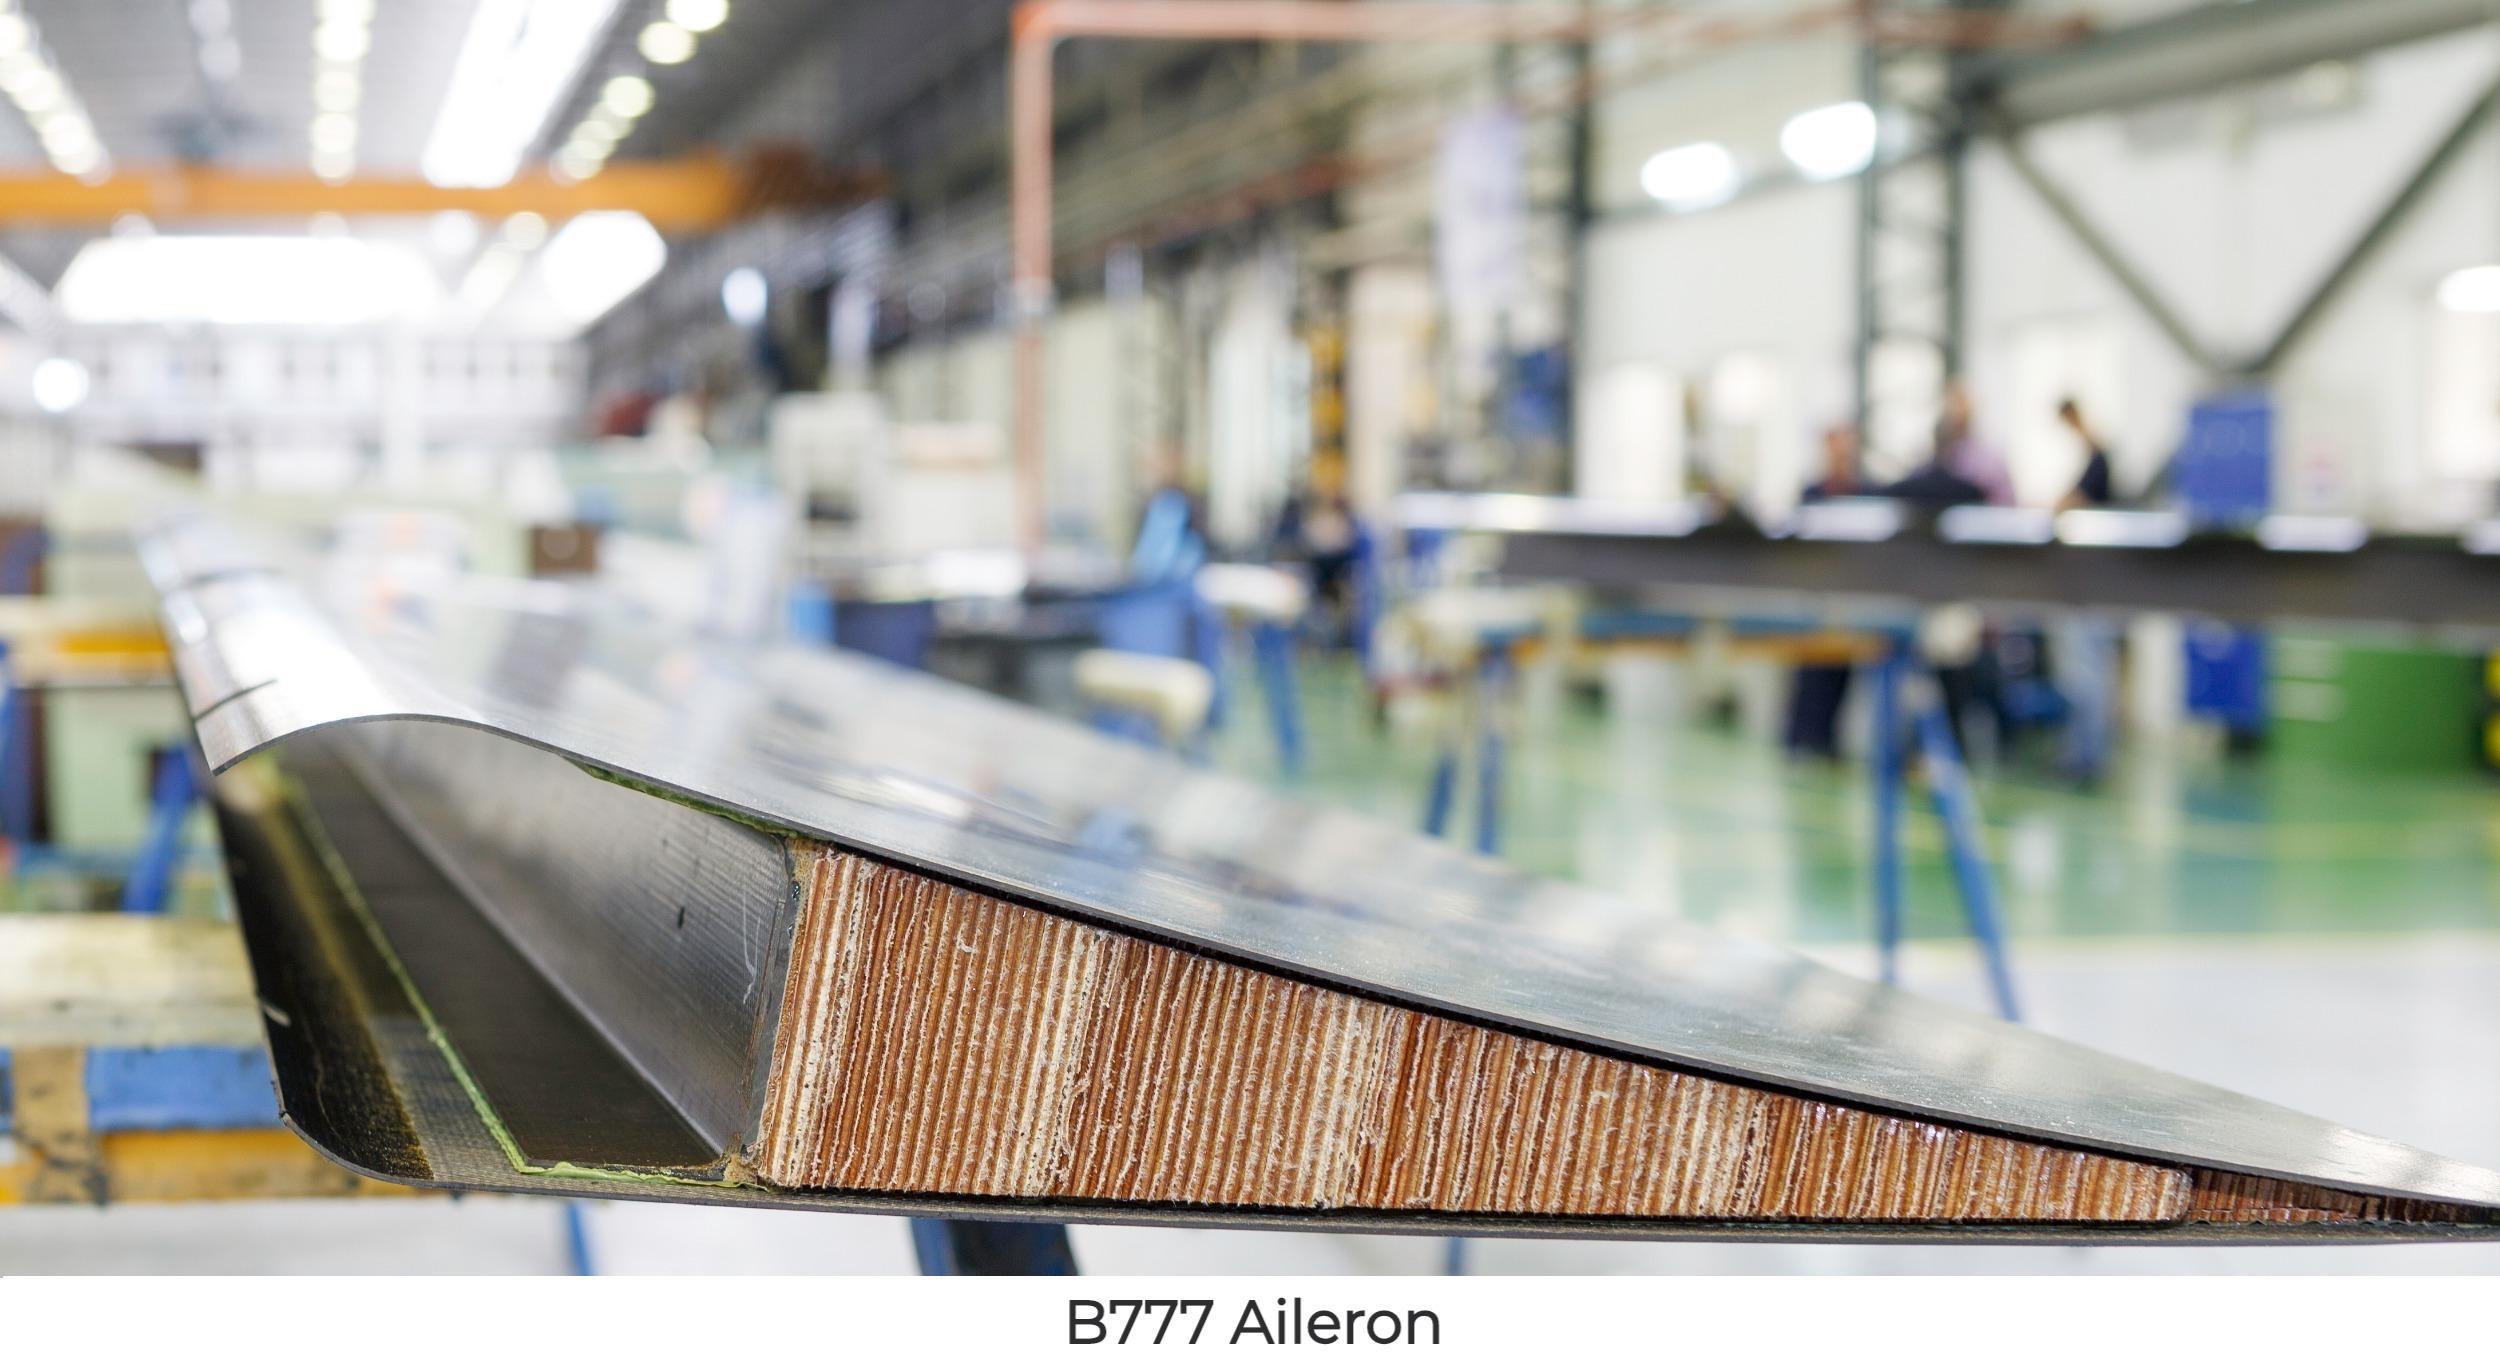 B777 Aileron